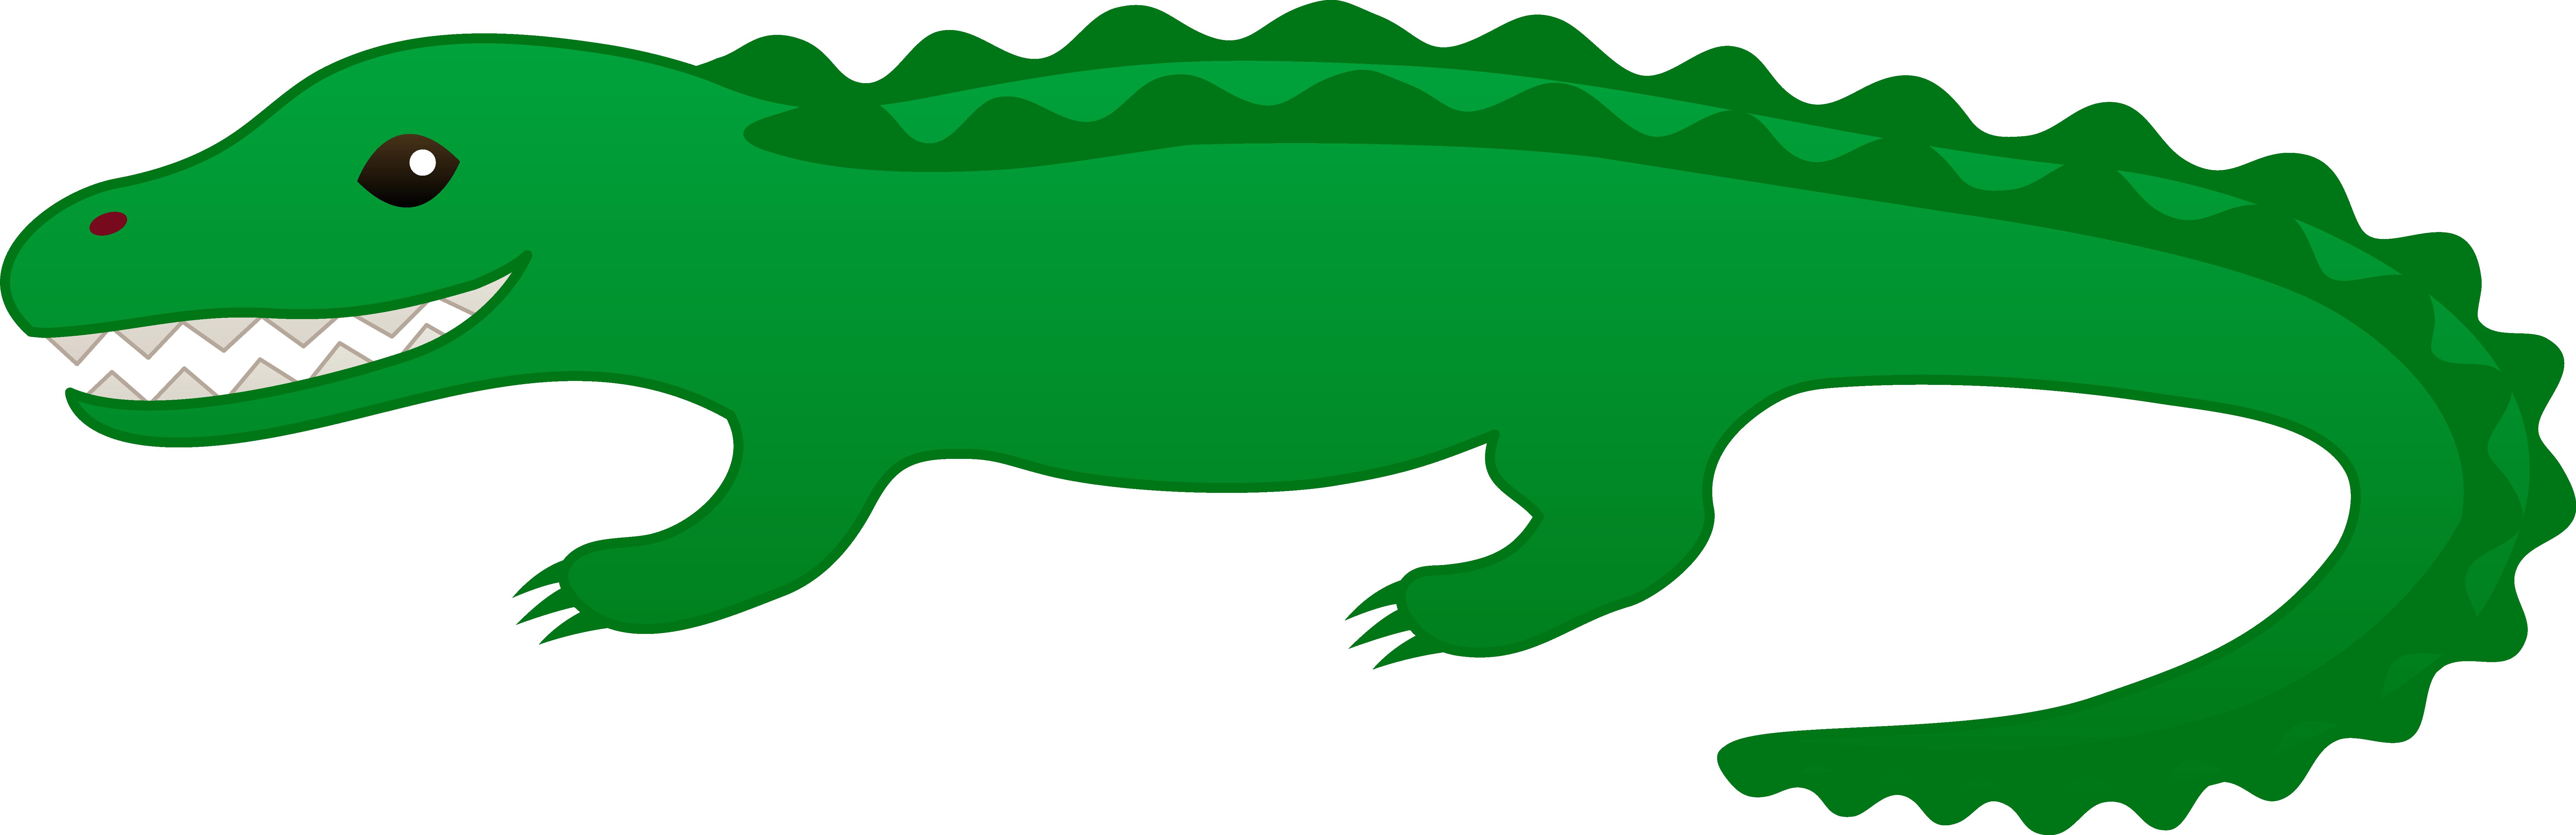 Water clipart cute. Green alligator